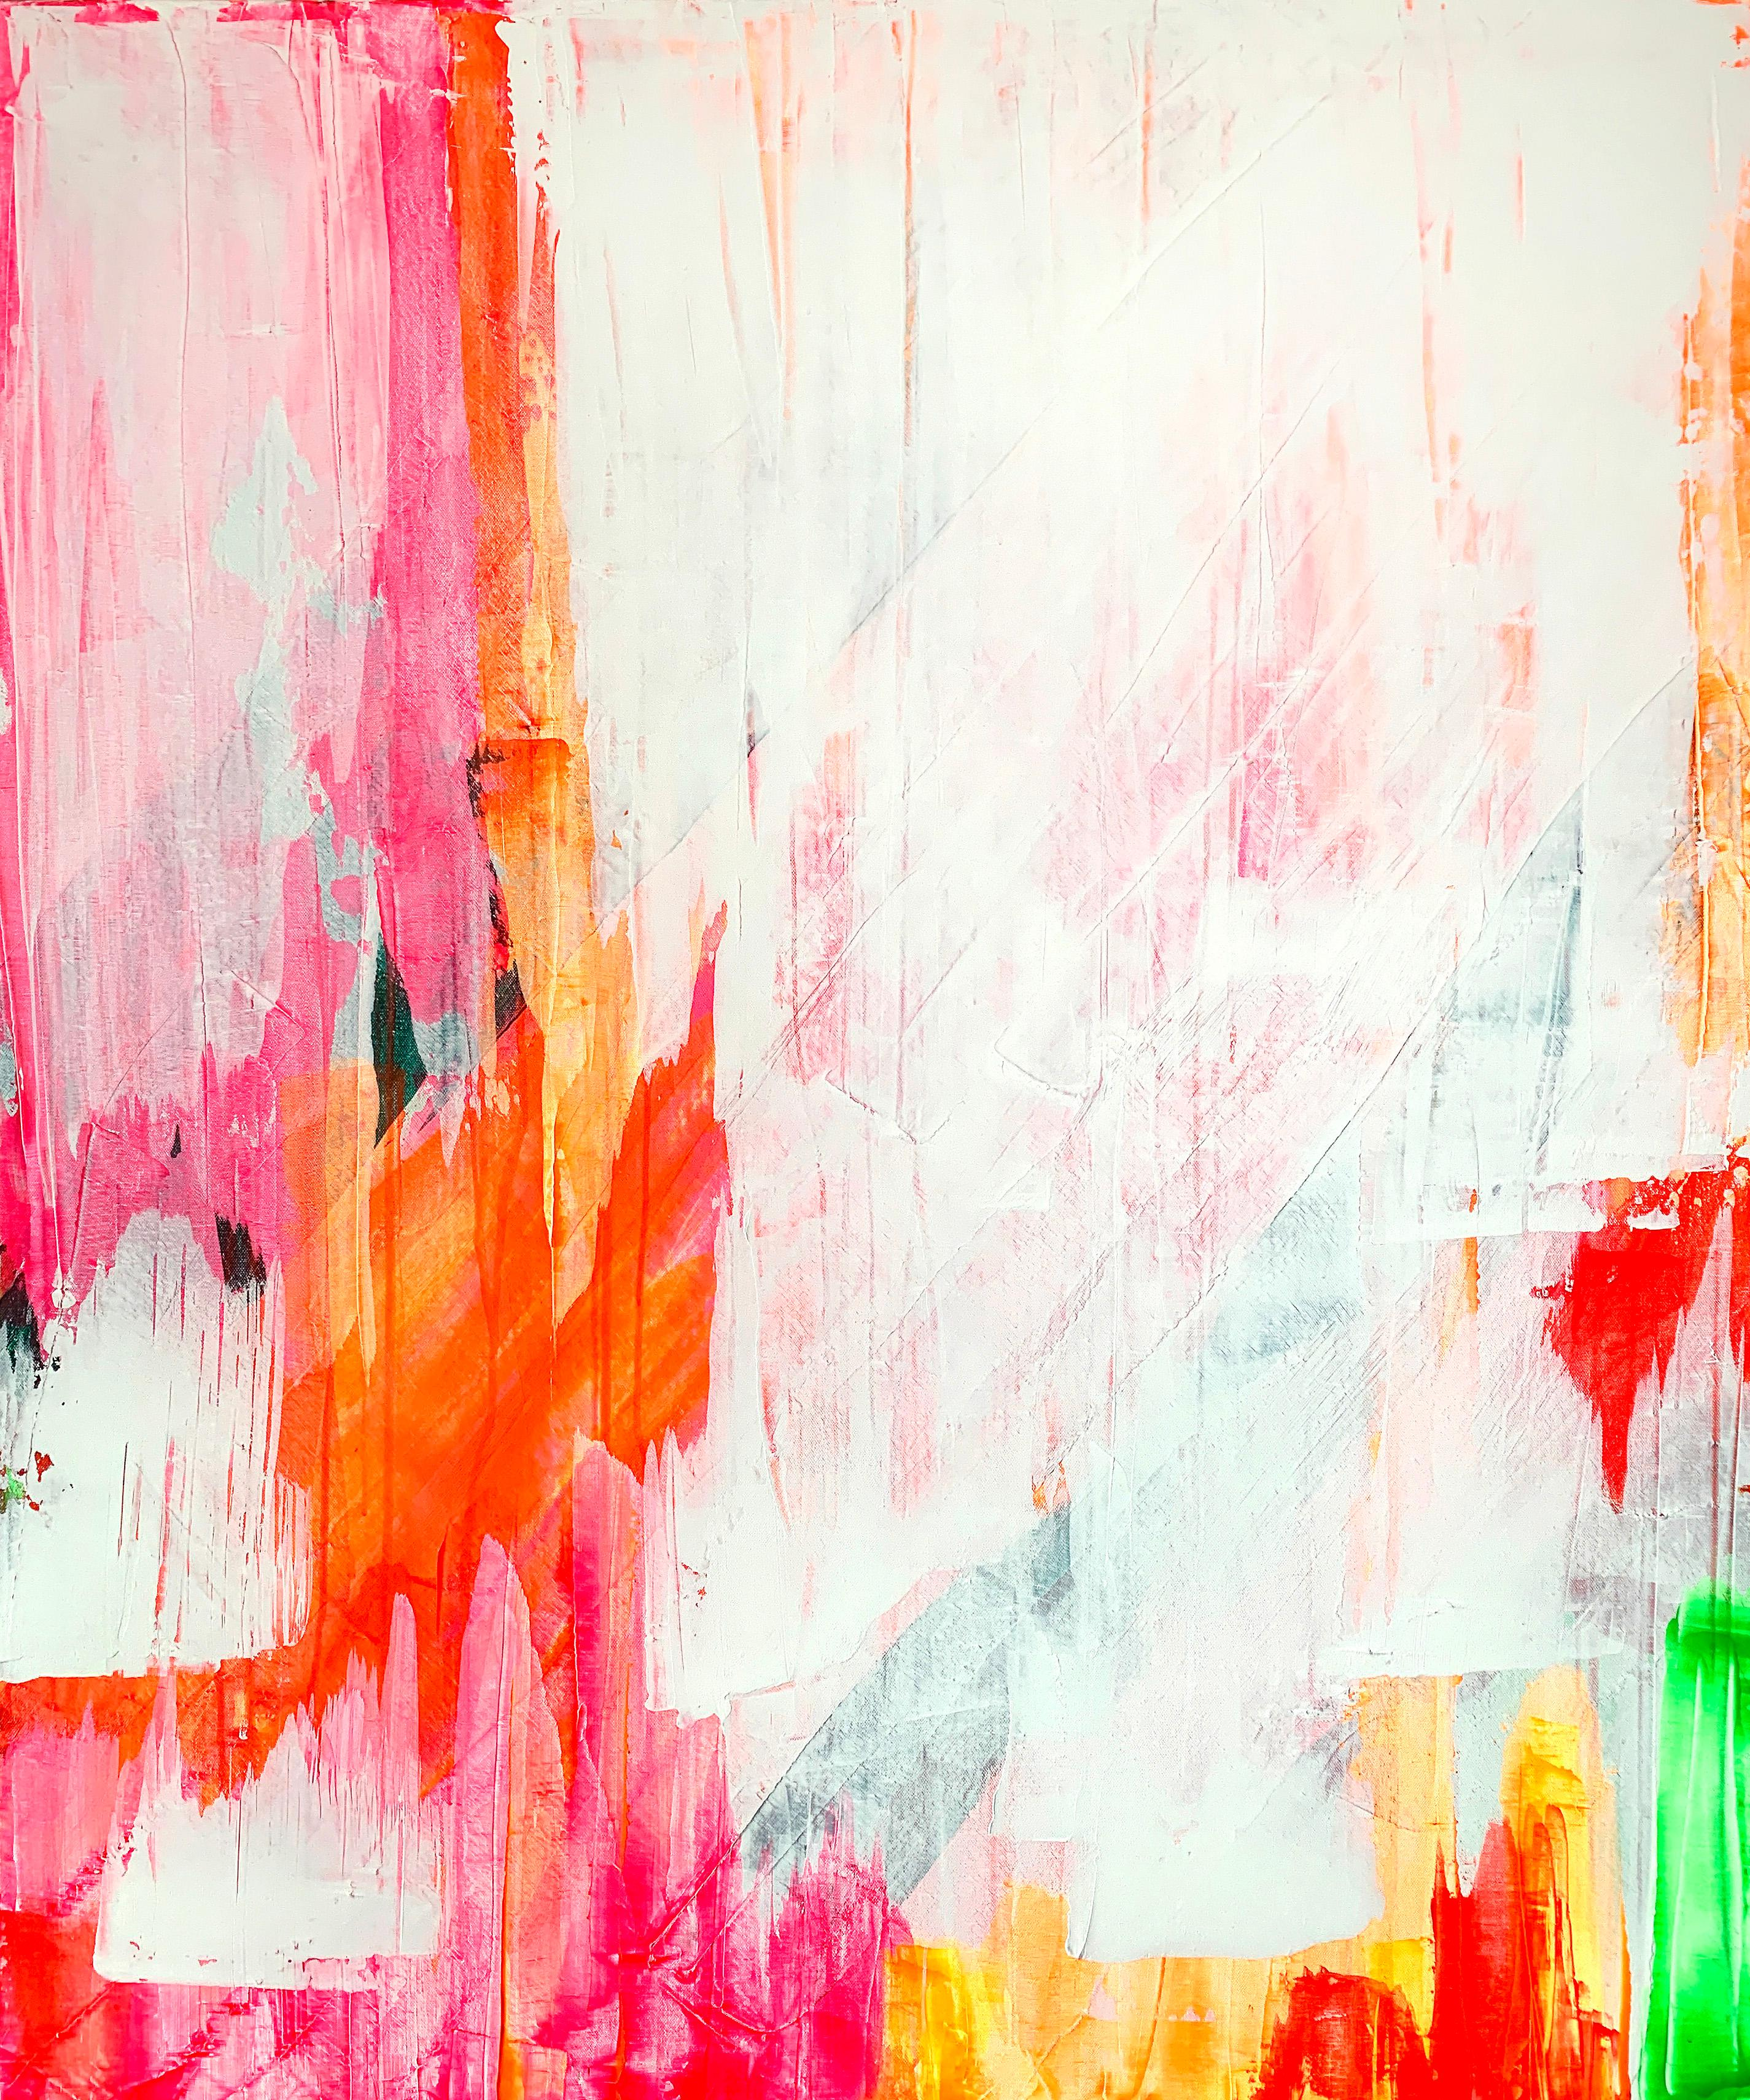 Untitled Colour Study No. 1, Acrylic on canvas, 120 x 100 cm, 2020